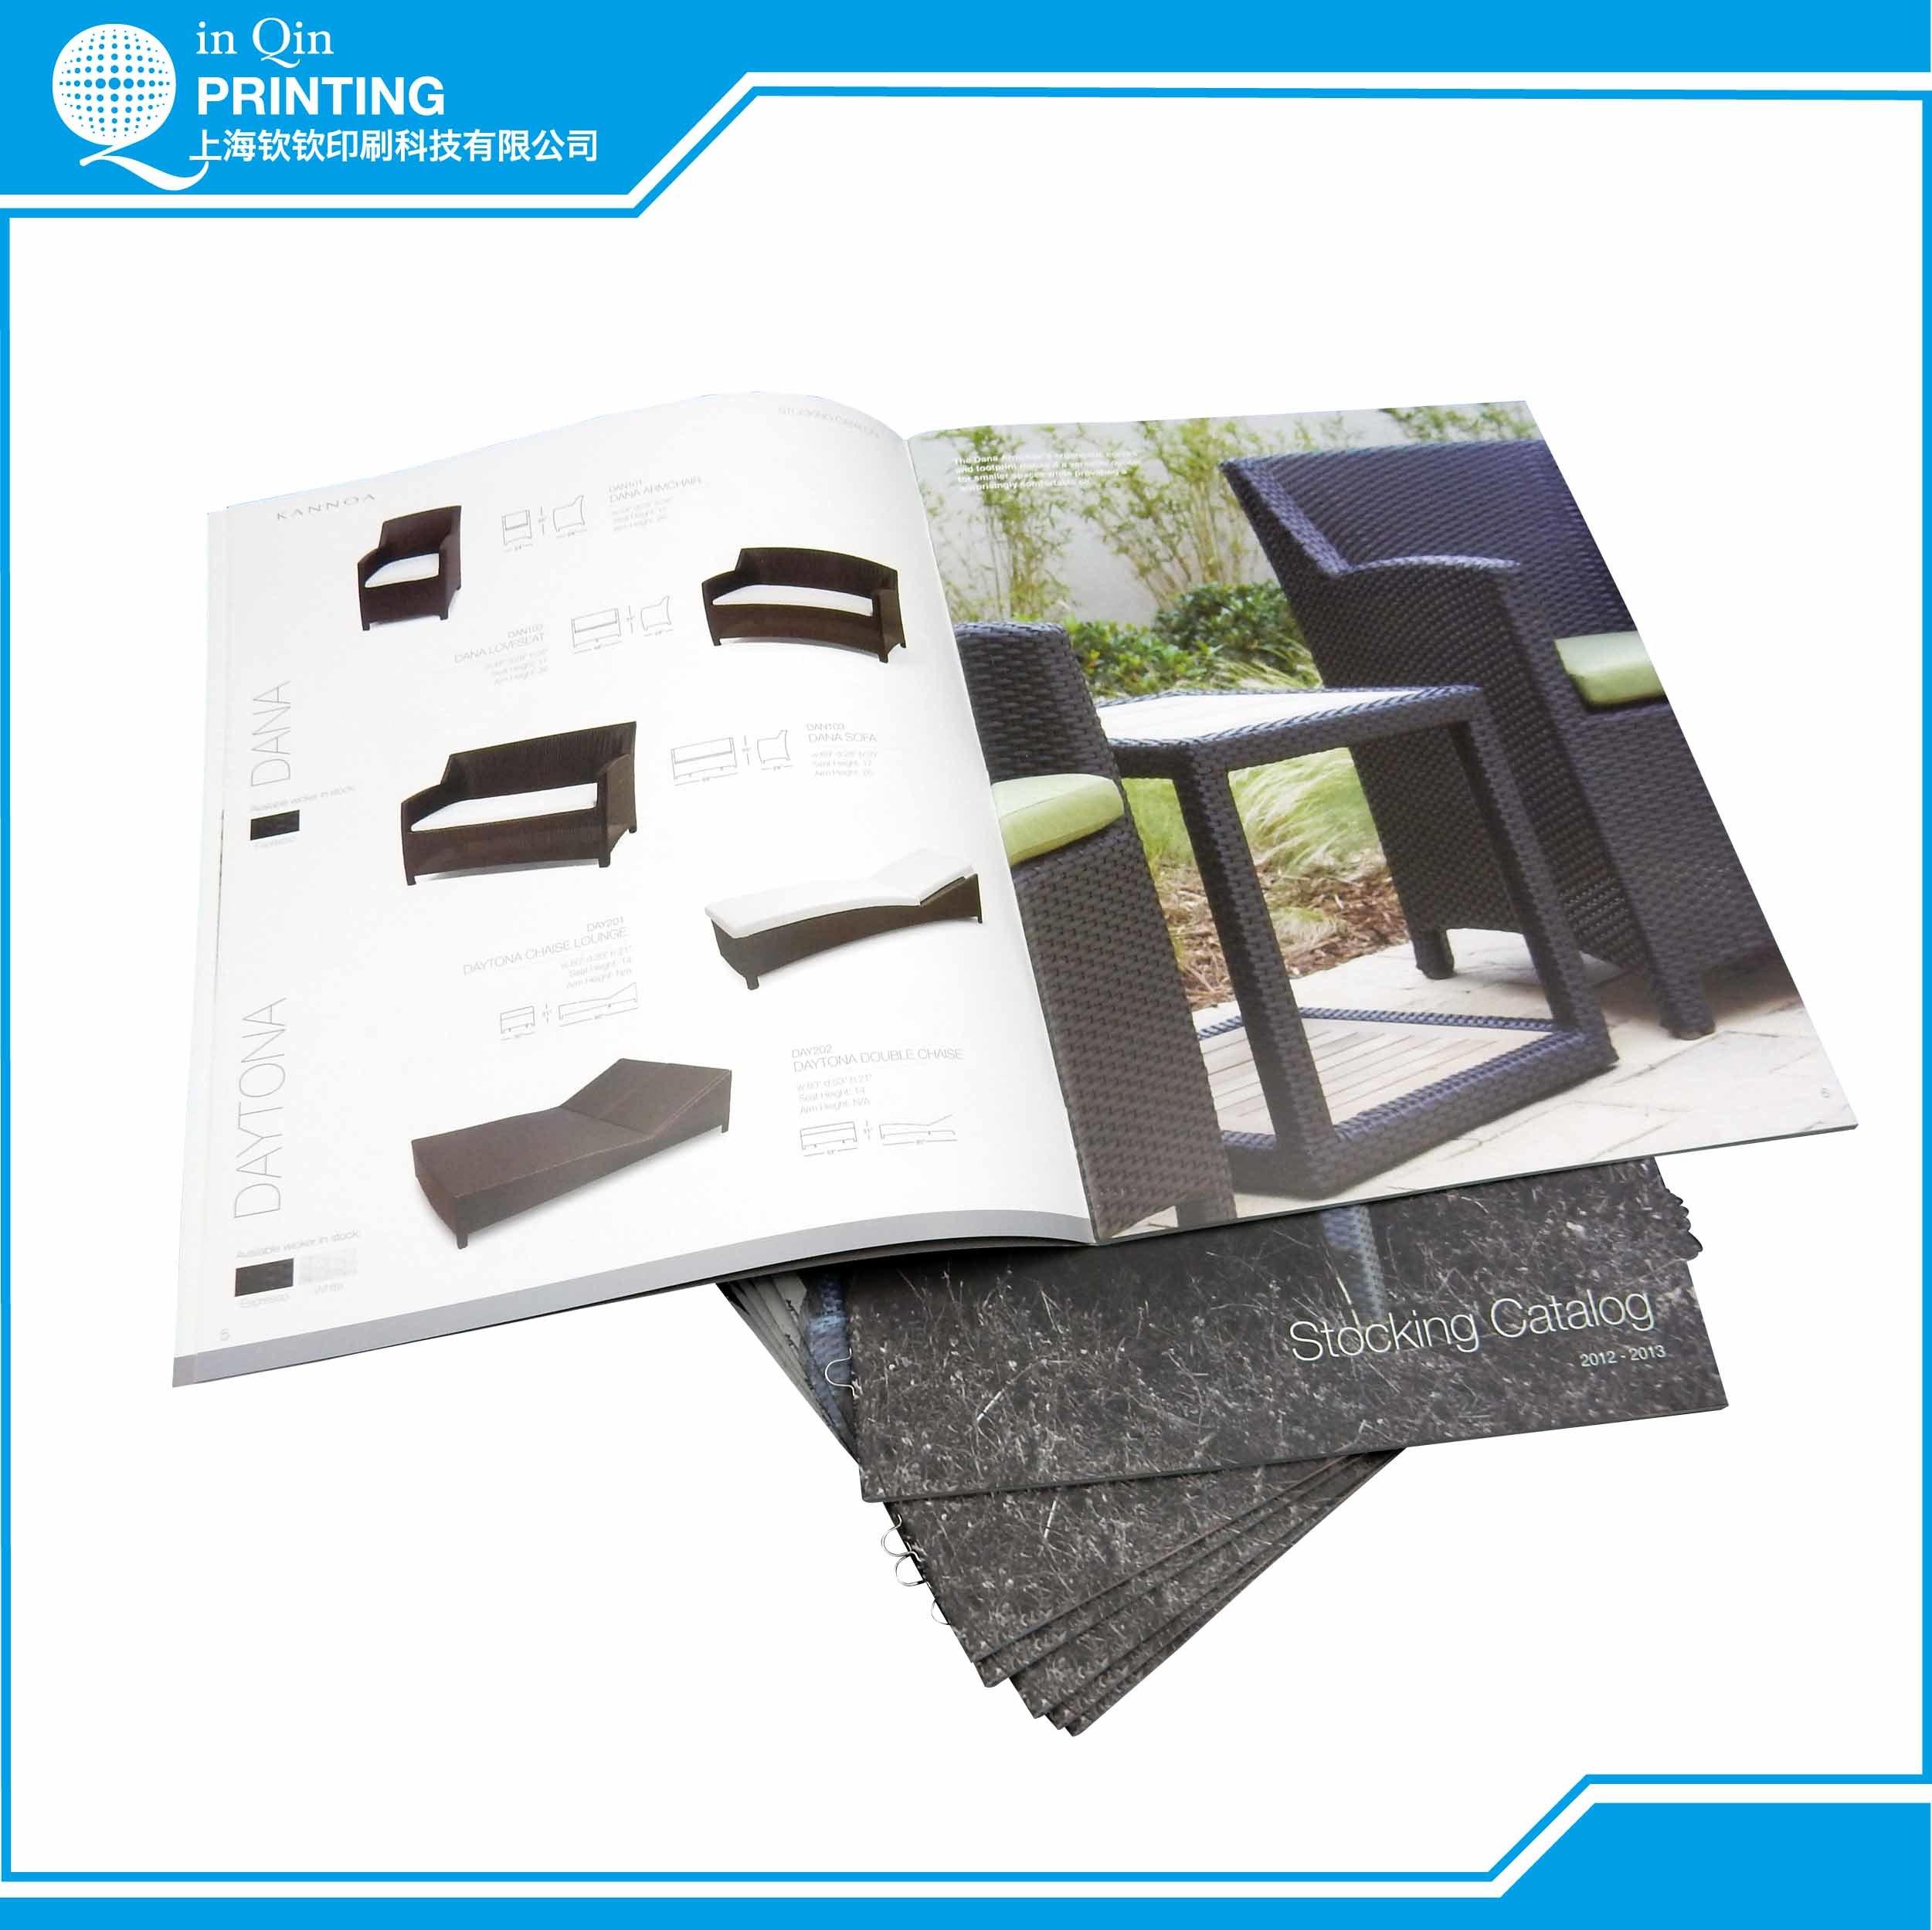 Staple Full Color Furniture Catalog Printing